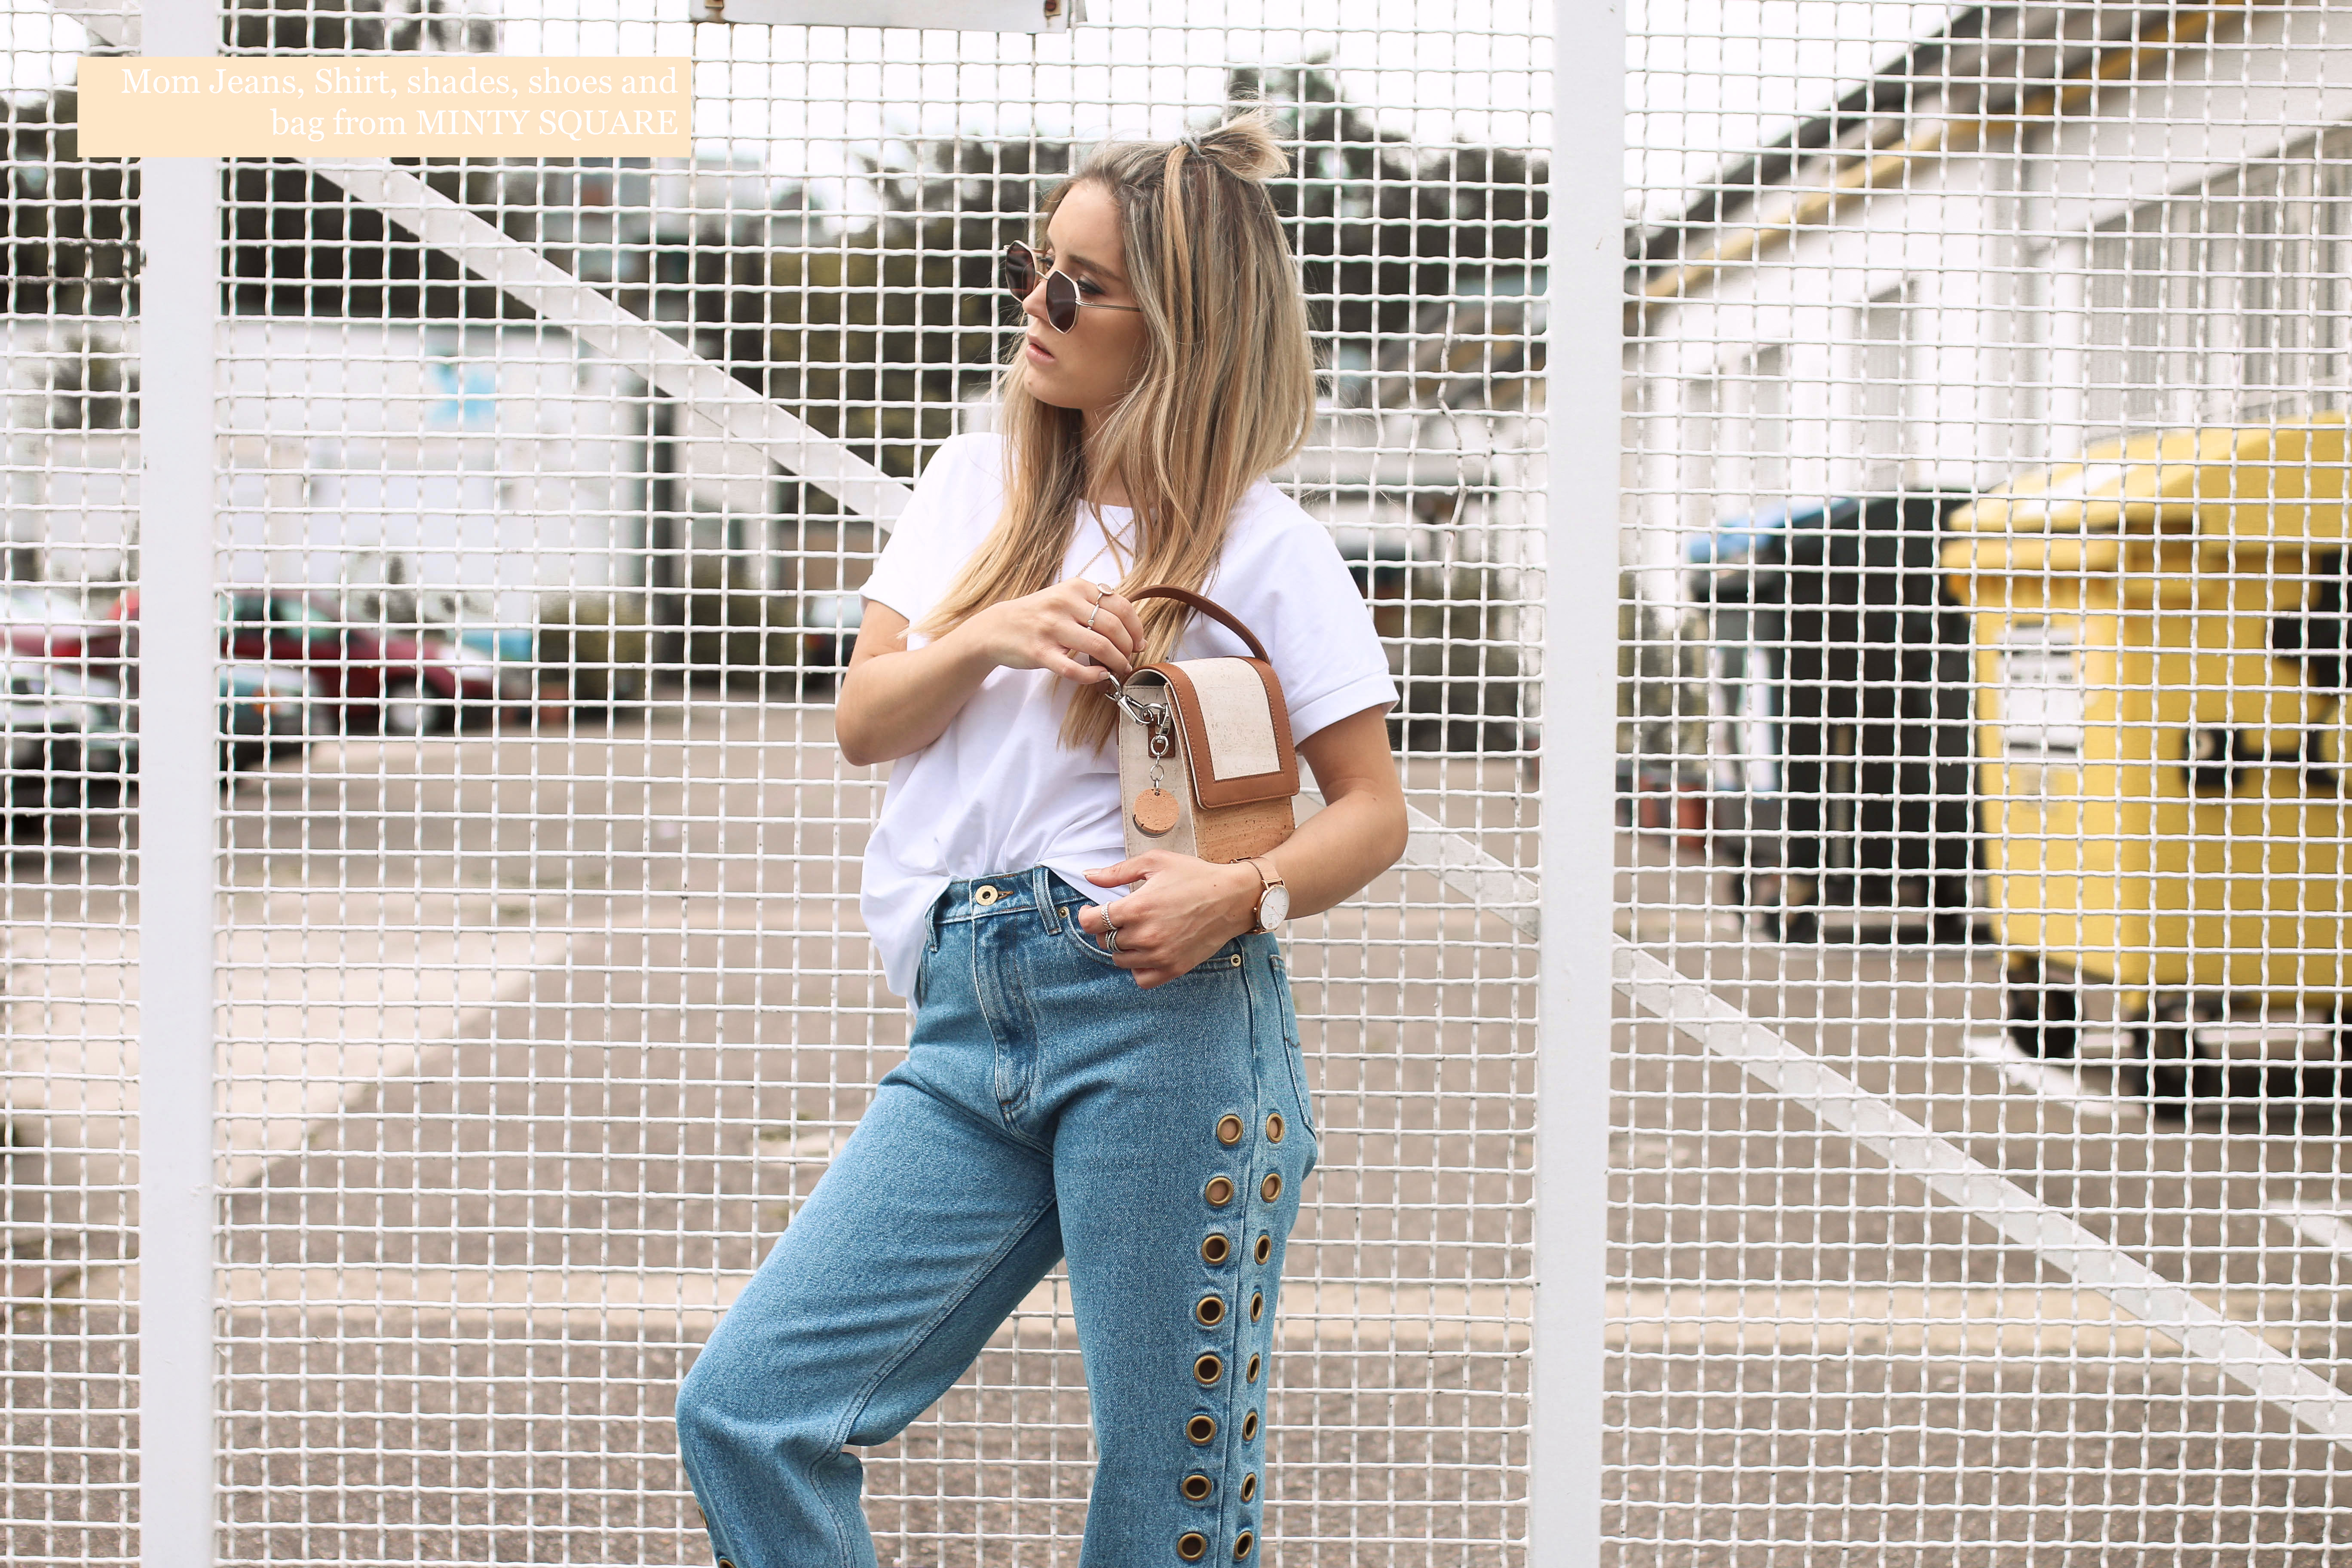 minty square denim streetstyle fashiontwinstinct